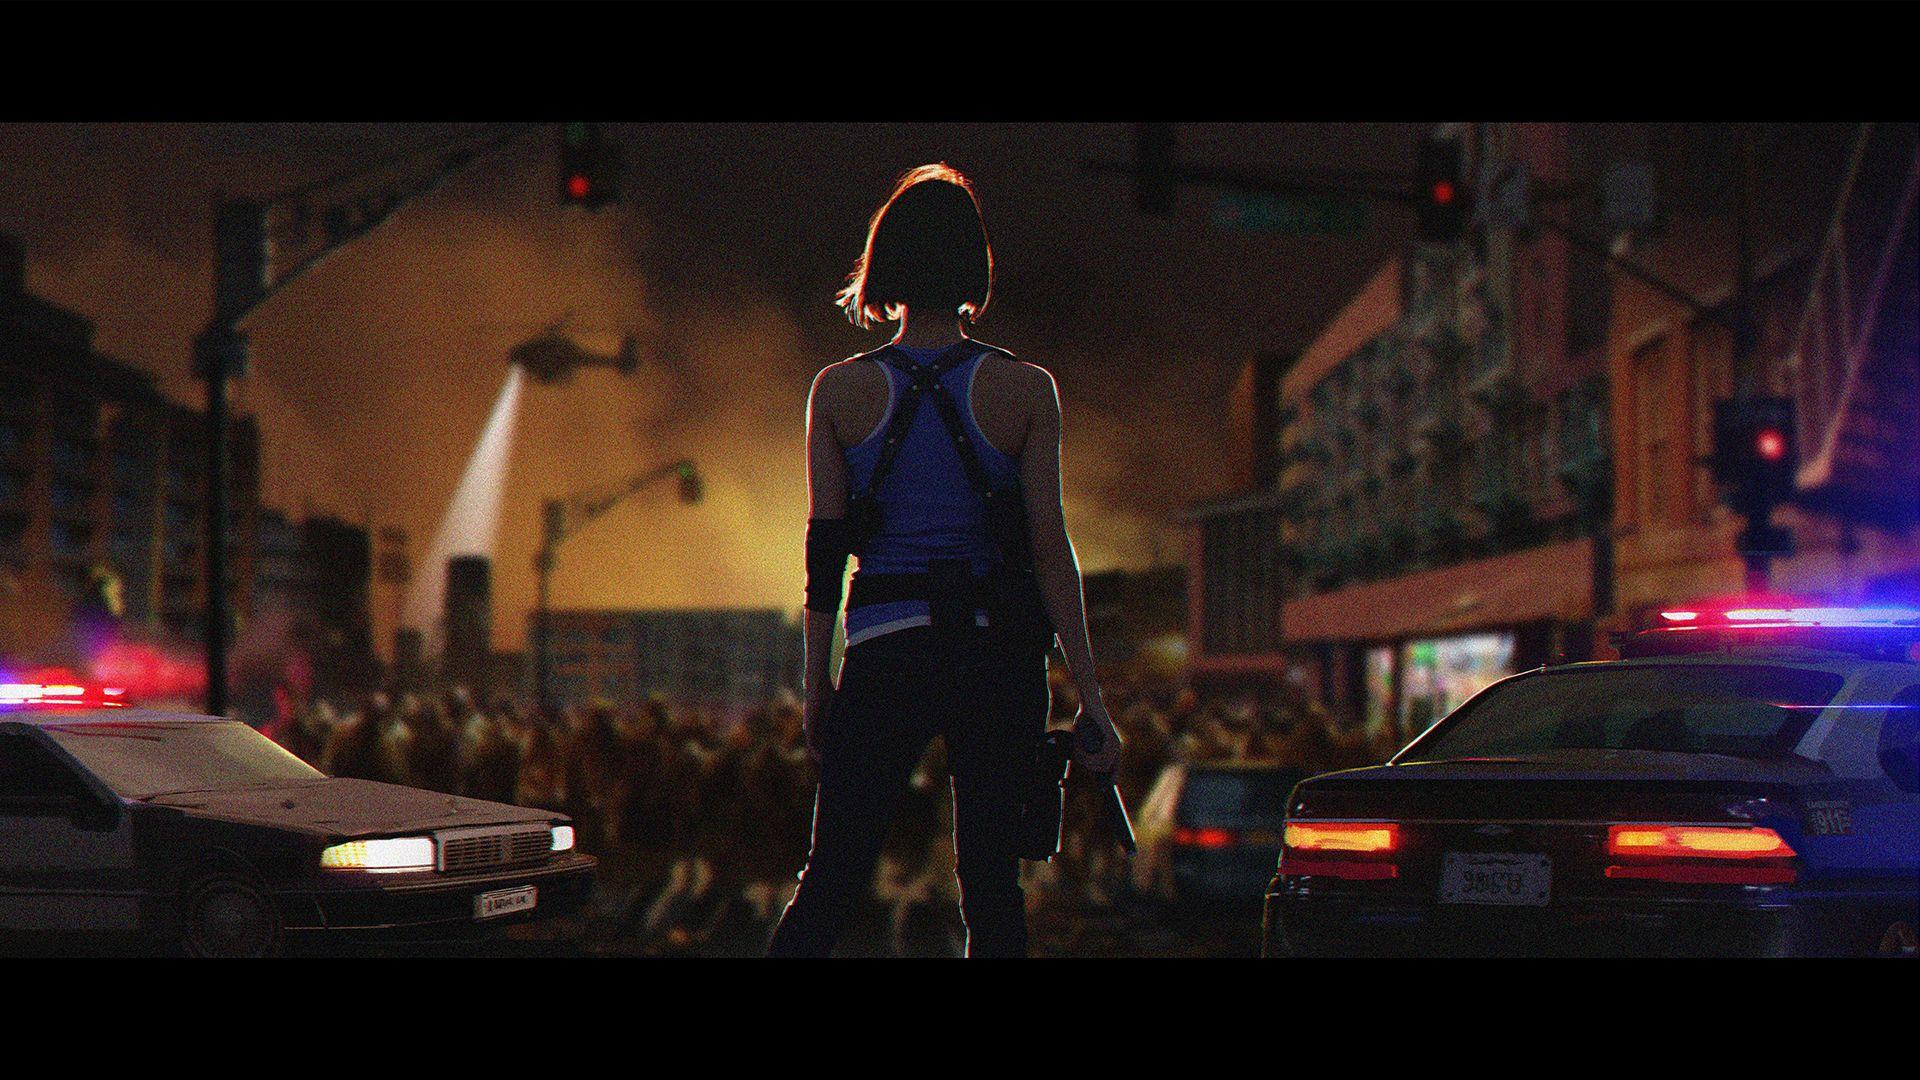 Resident Evil 3 Remake New Screenshots Concept Art And Video For Your Eyeballs Vg247